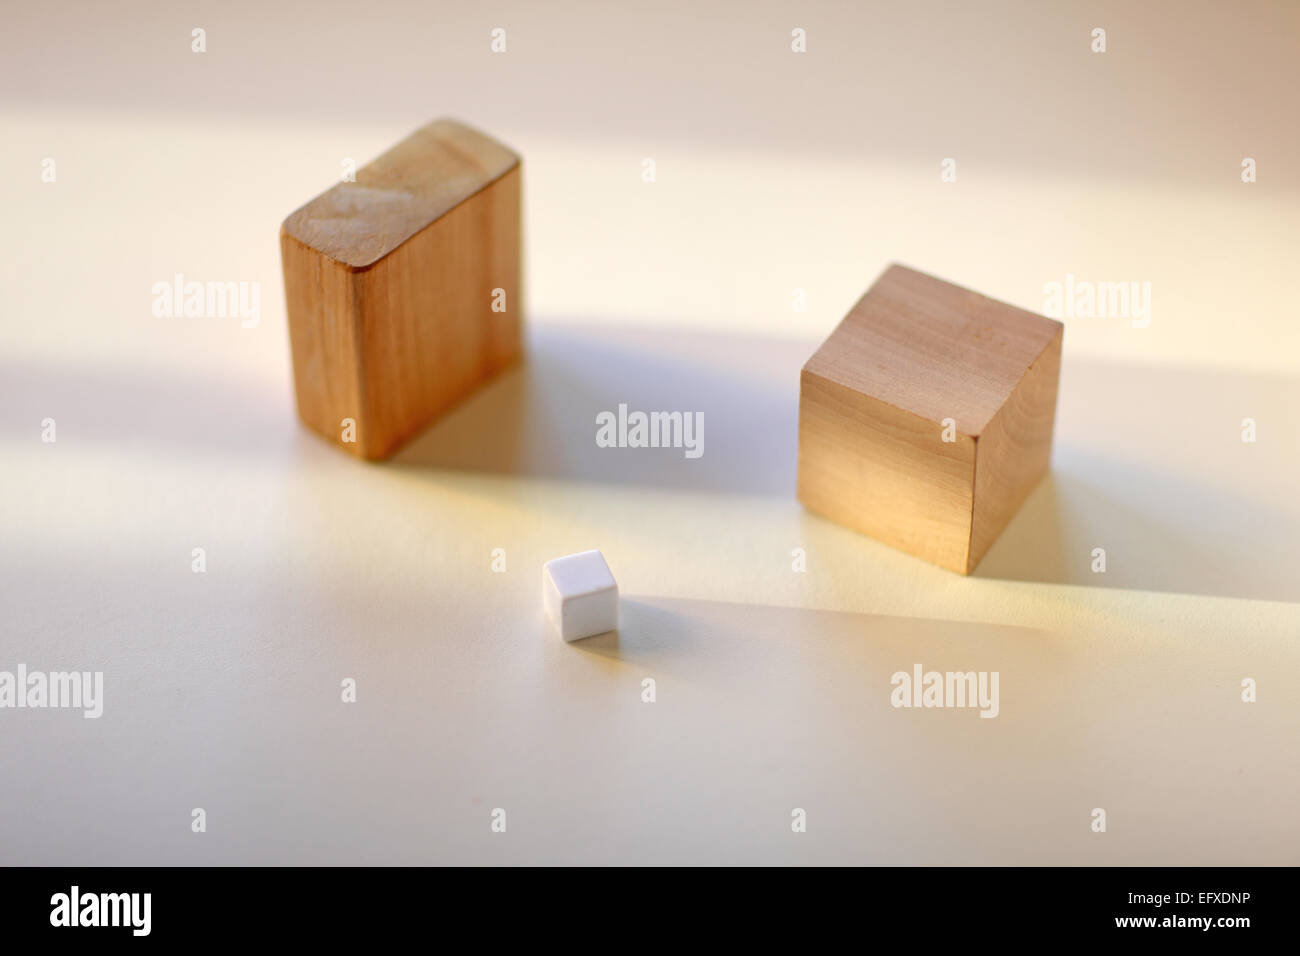 blocks shapes three wood - Stock Image